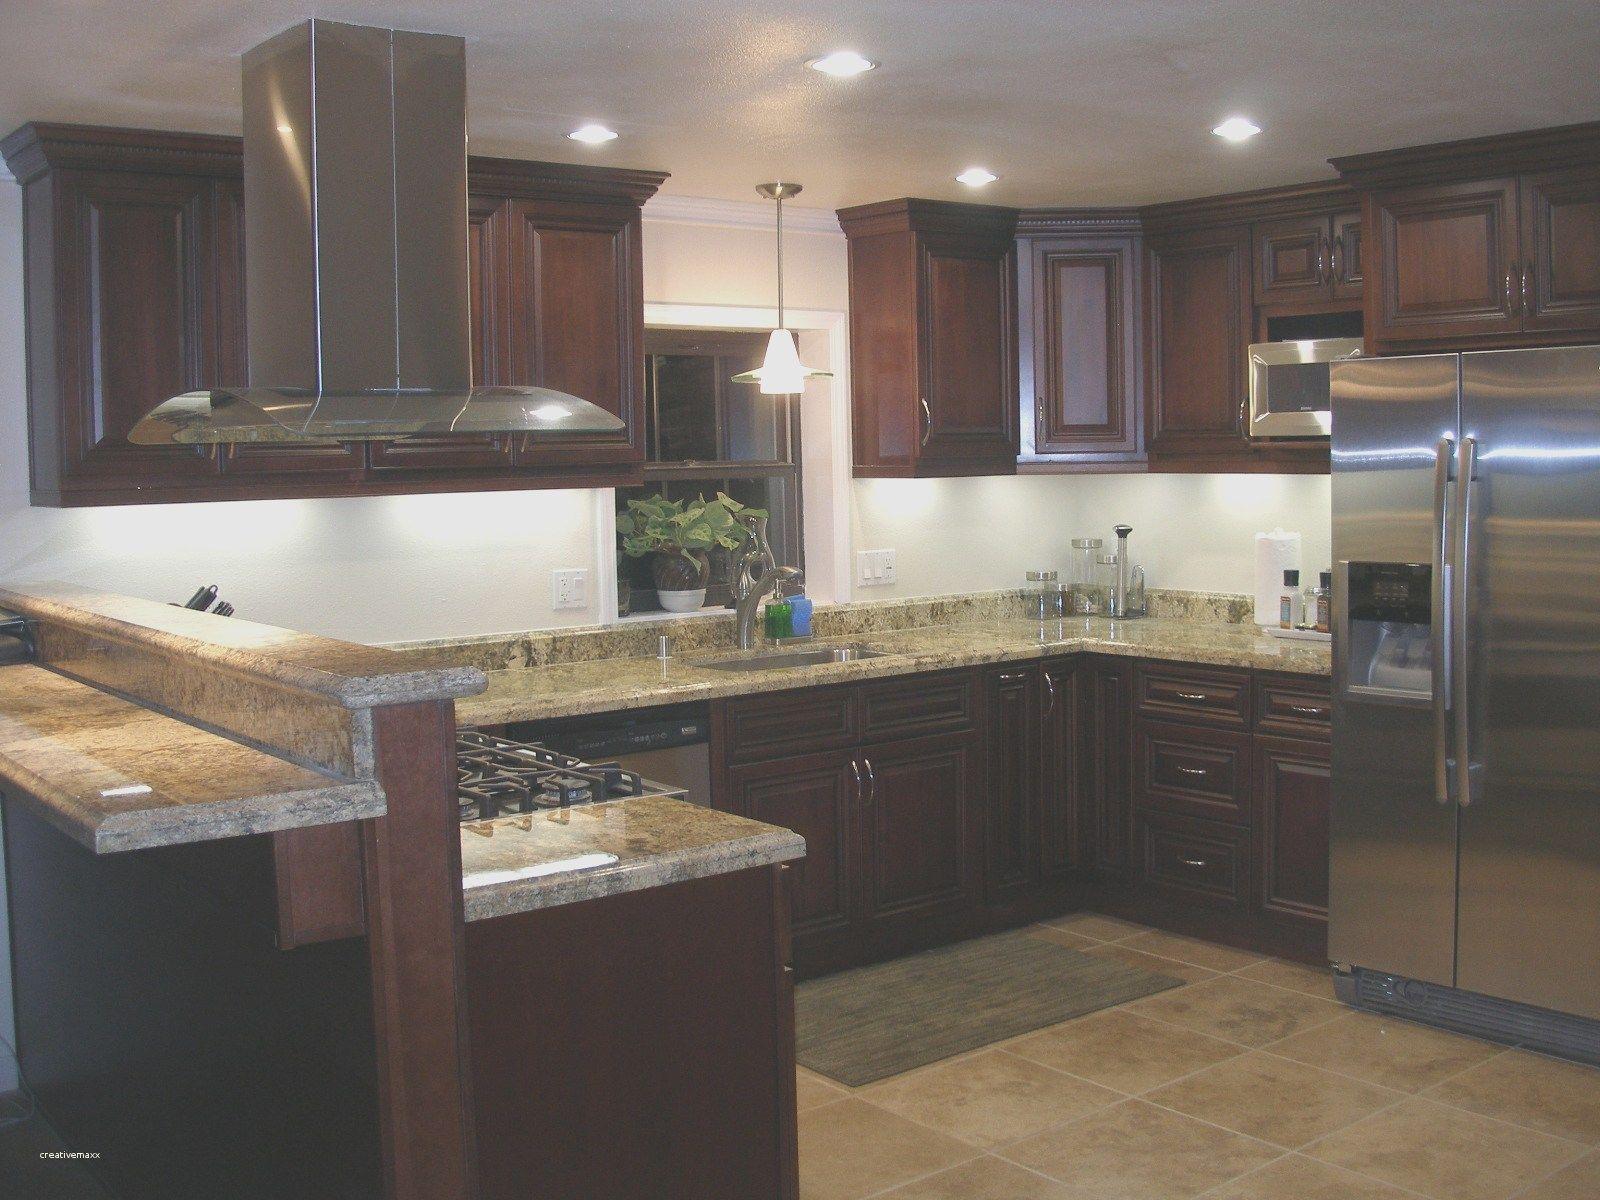 Kitchen Remodel Ideas   Lovely Kitchen Remodel Ideas, Kitchen Kitchen  Remodel Ideas From Lowes Kitchen